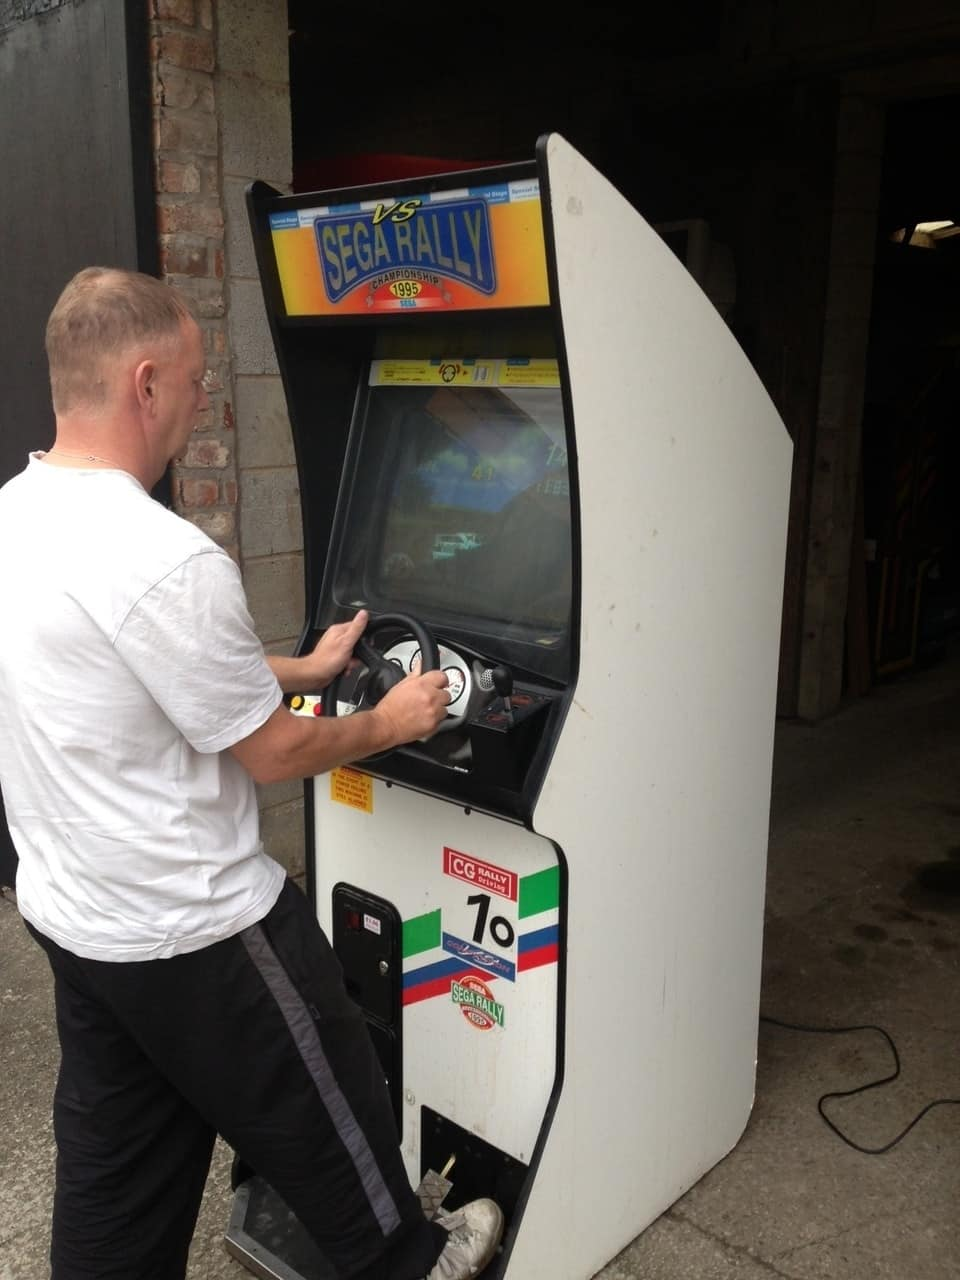 Sega Rally 1 Upright Arcade Machine